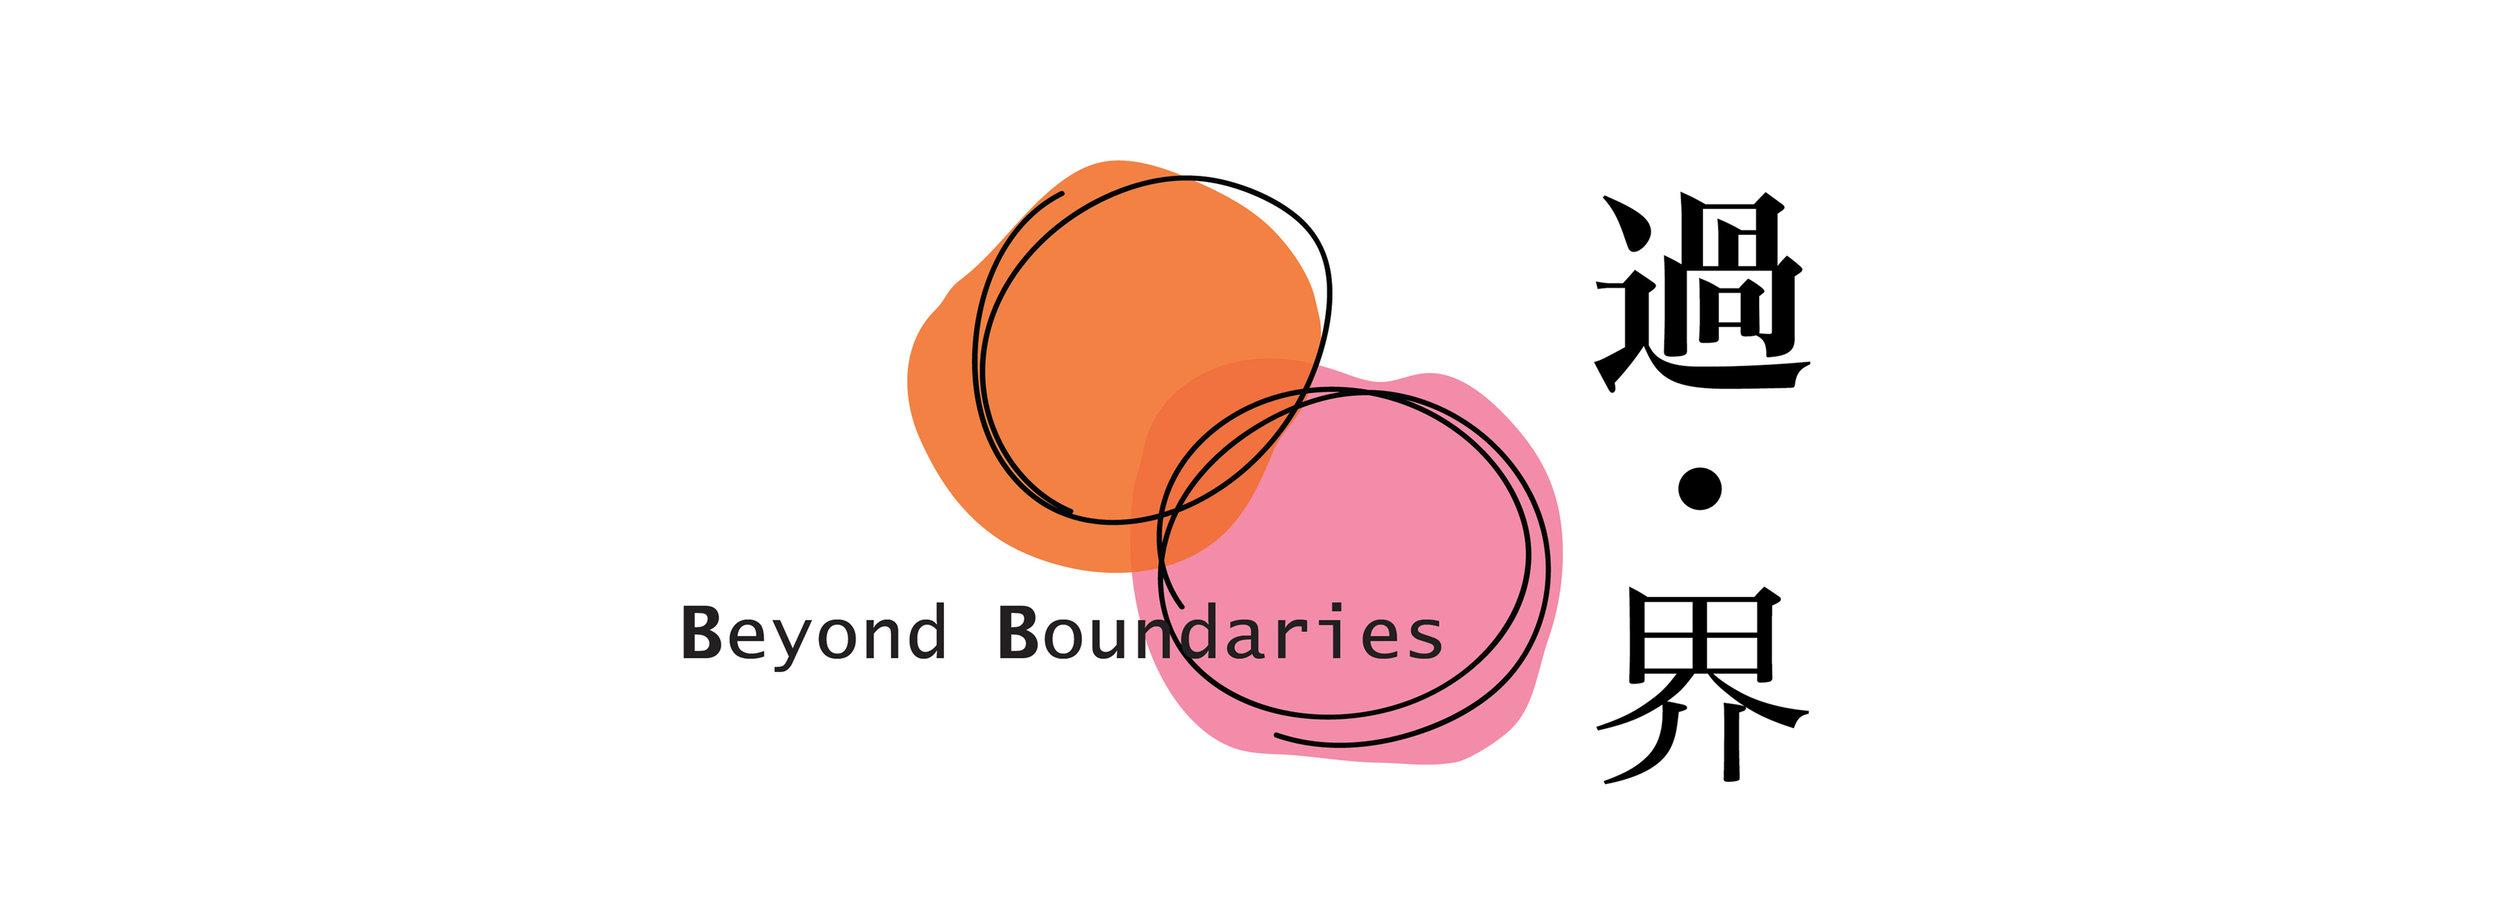 Beyond Boundaries_FB Banner_R4.jpg